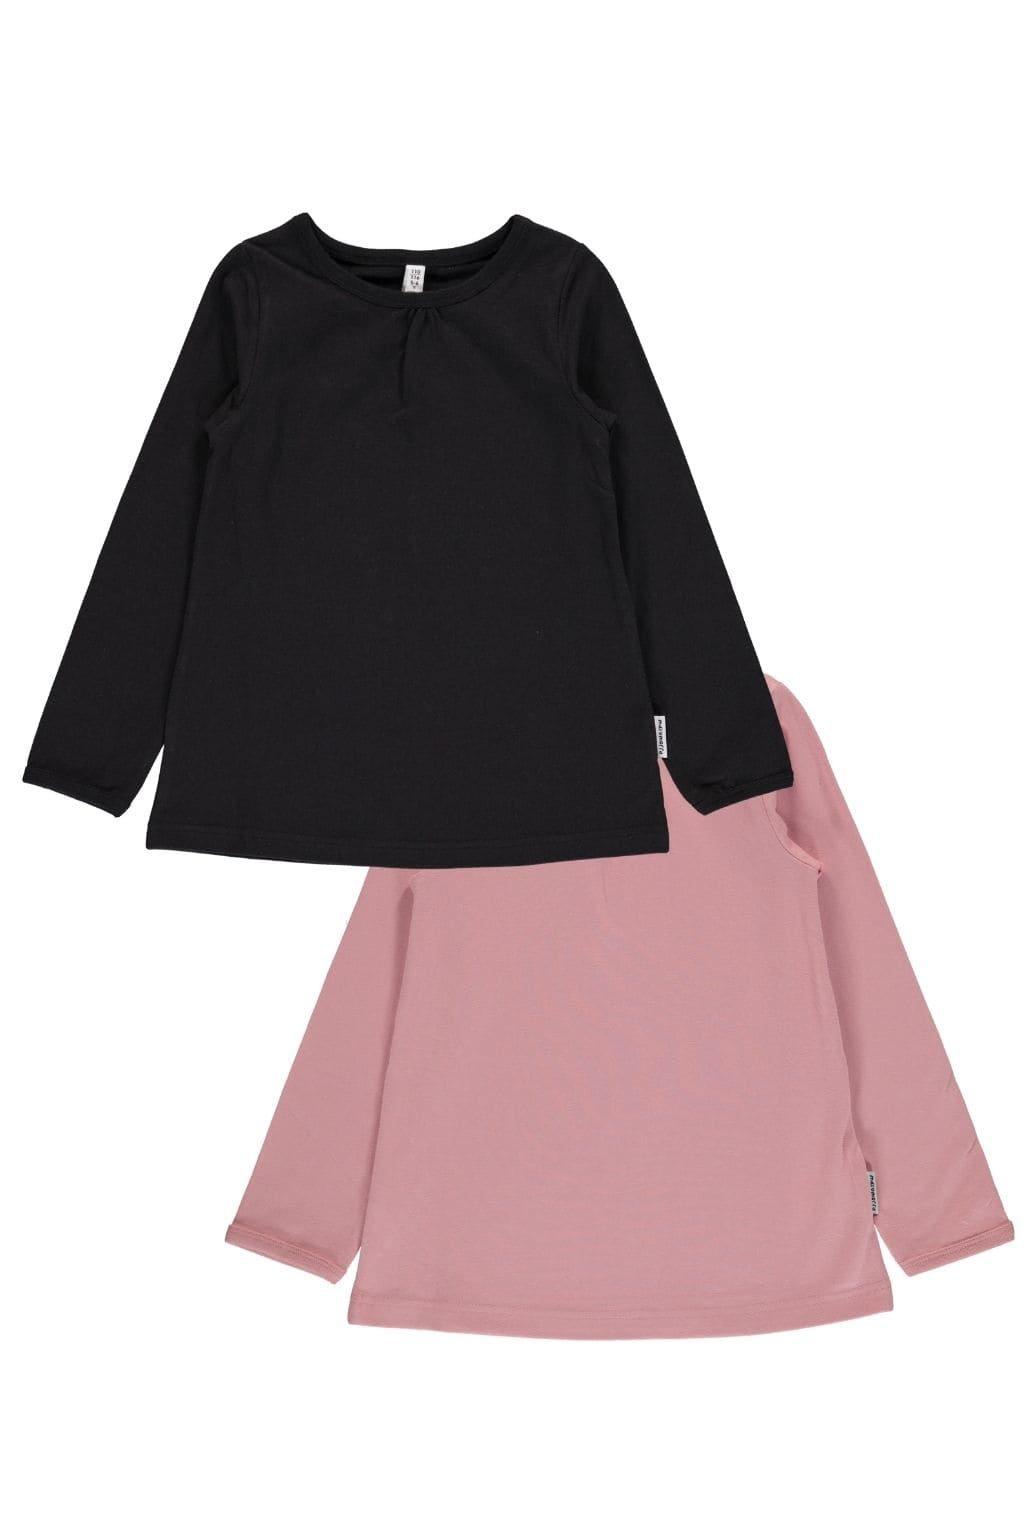 tee ls dusty pink + black (1)